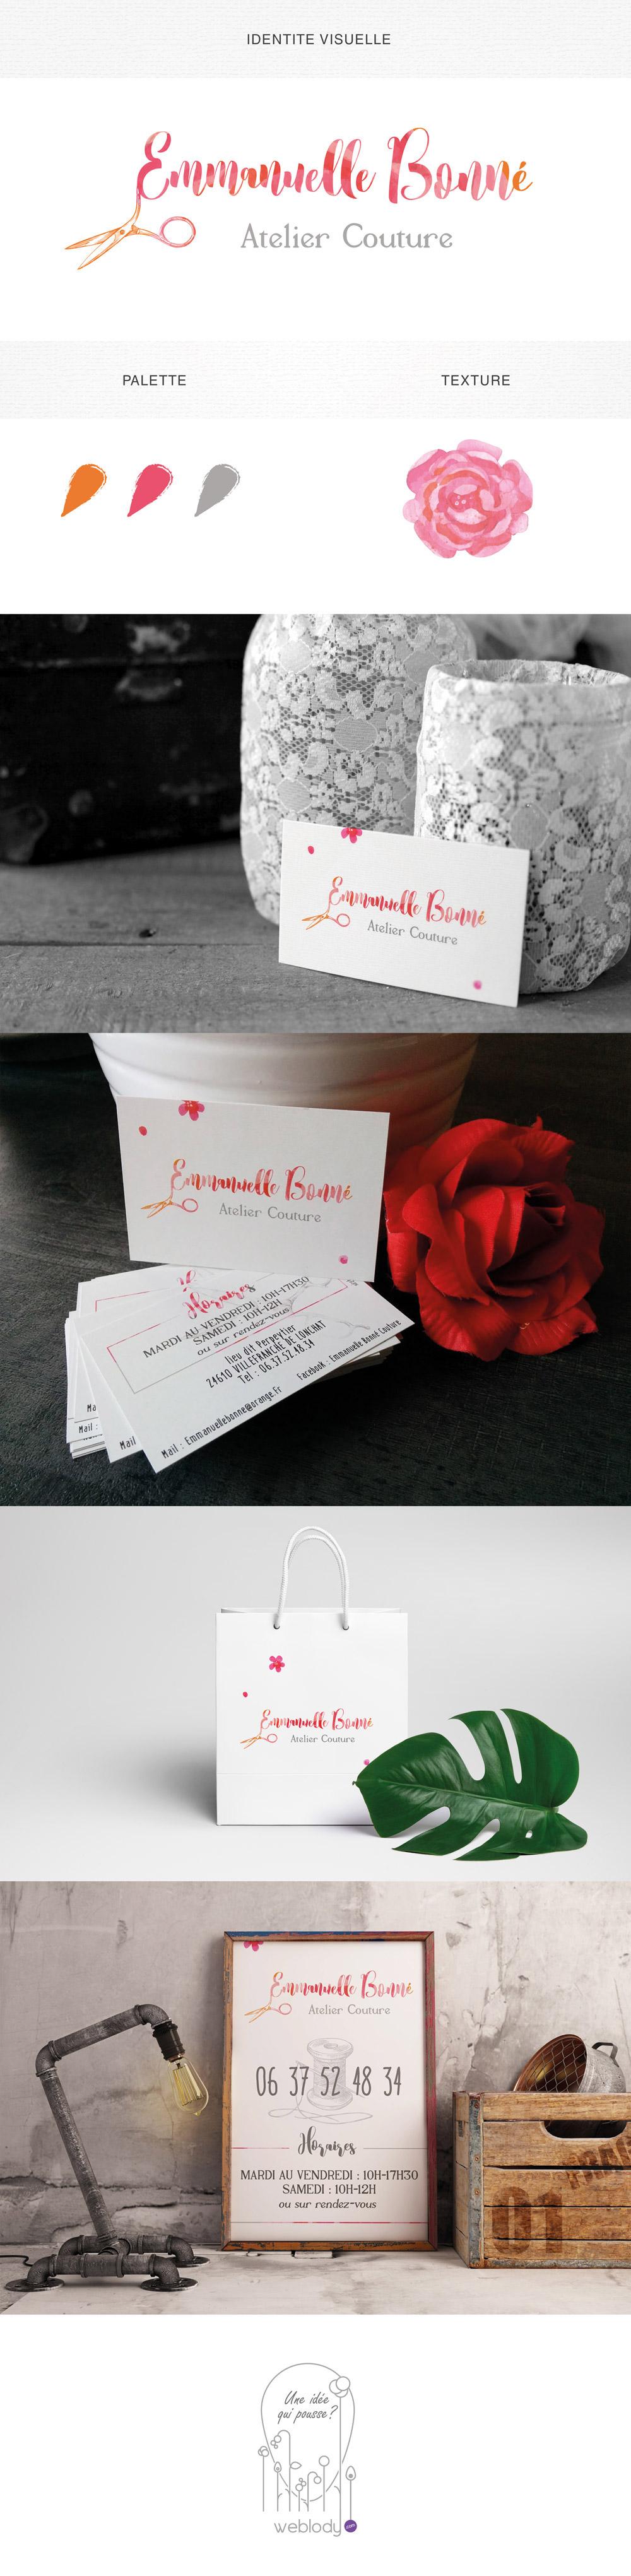 couture,couturiere  ,vintage,rose,orange,logo,carte visite,sac,ciseau,weblody